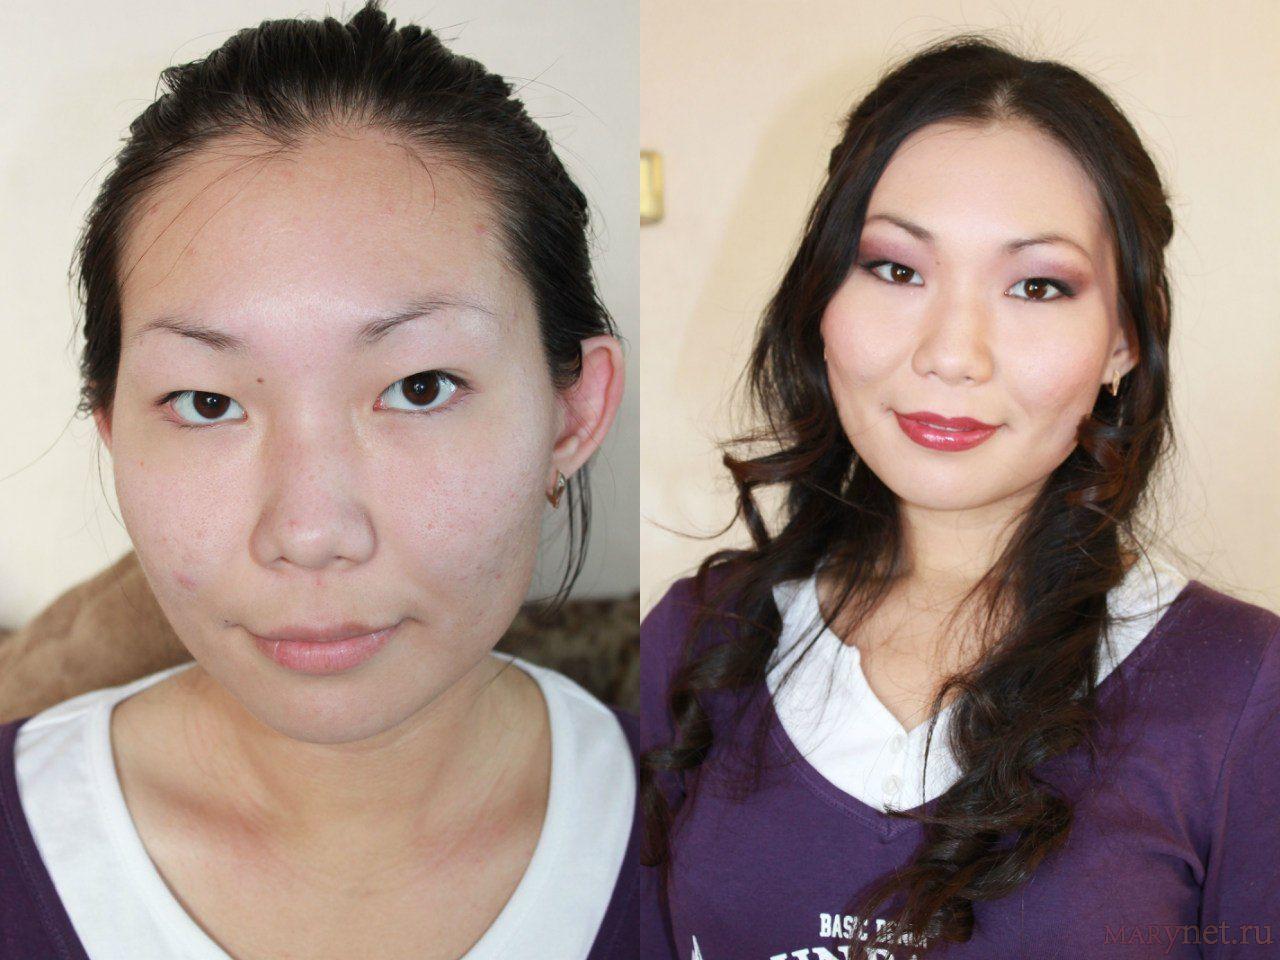 Японка до после макияж фото